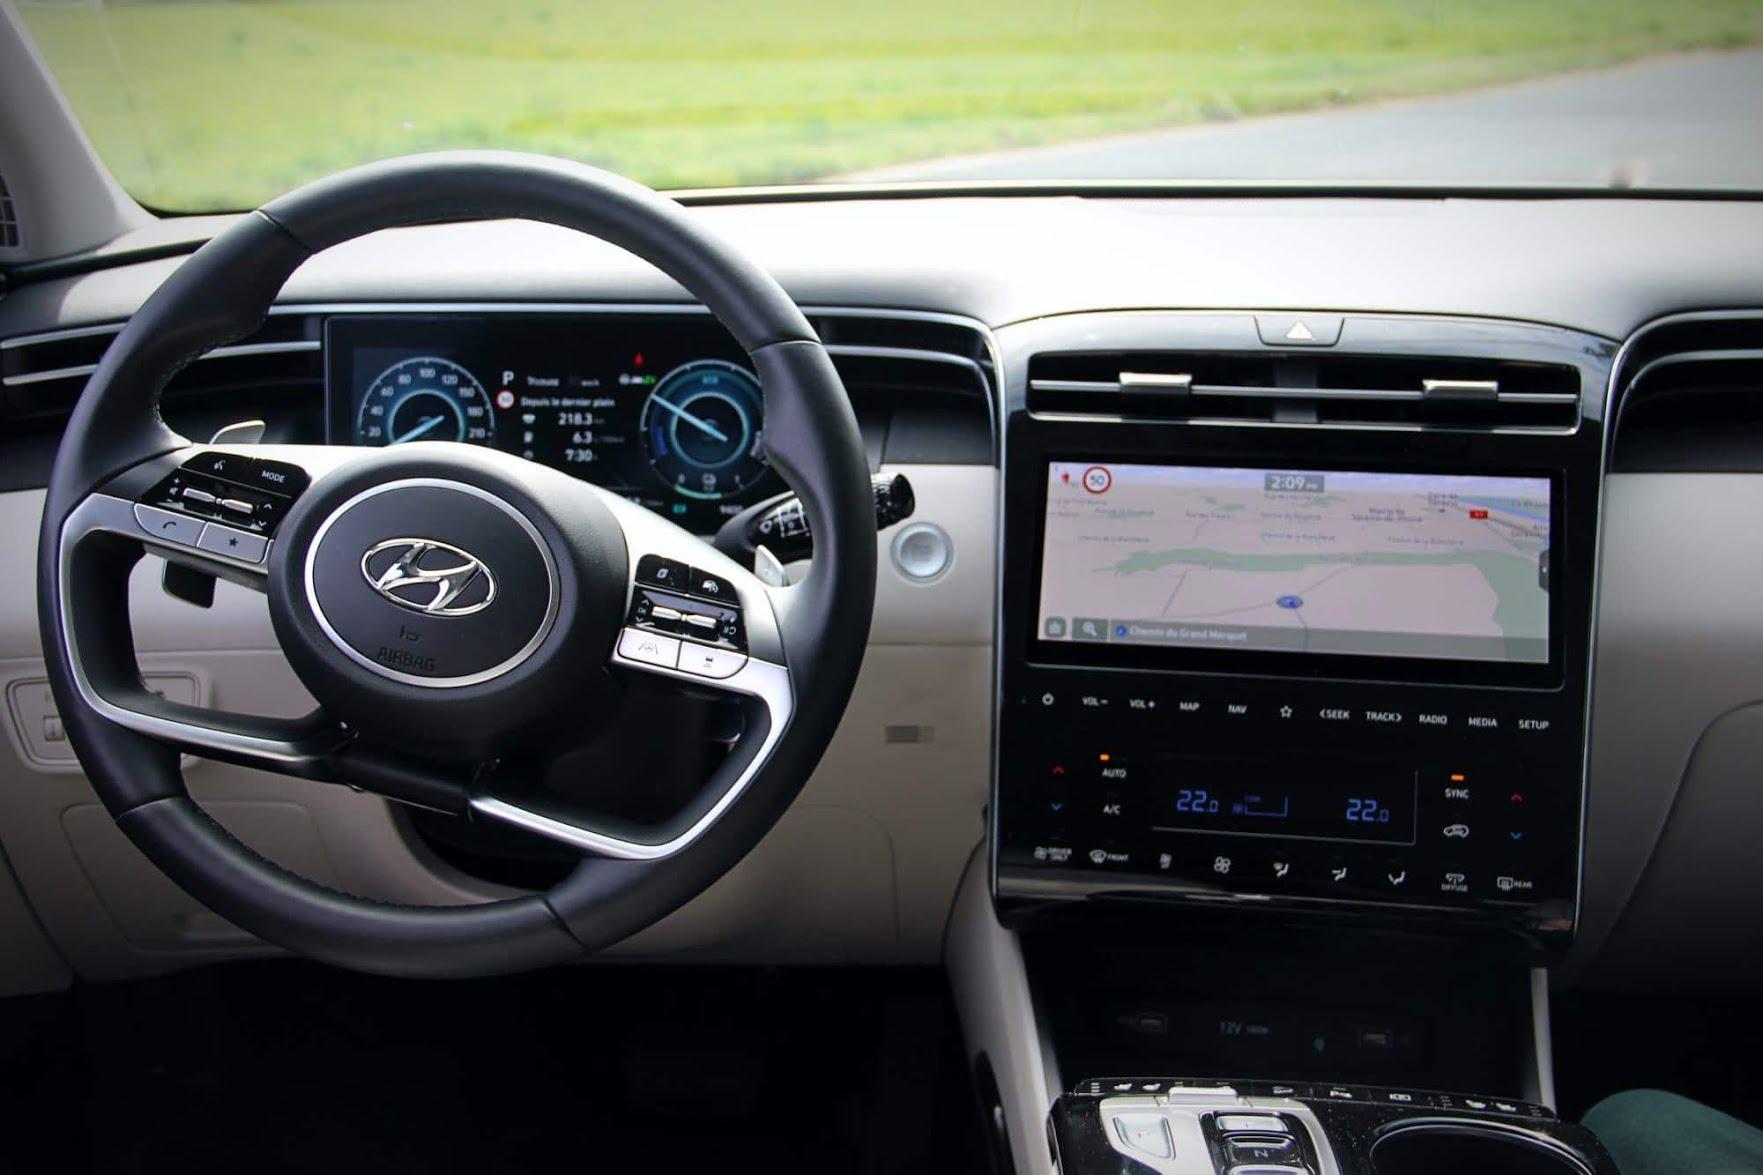 Planche de bord du Hyundai Tucson hybride